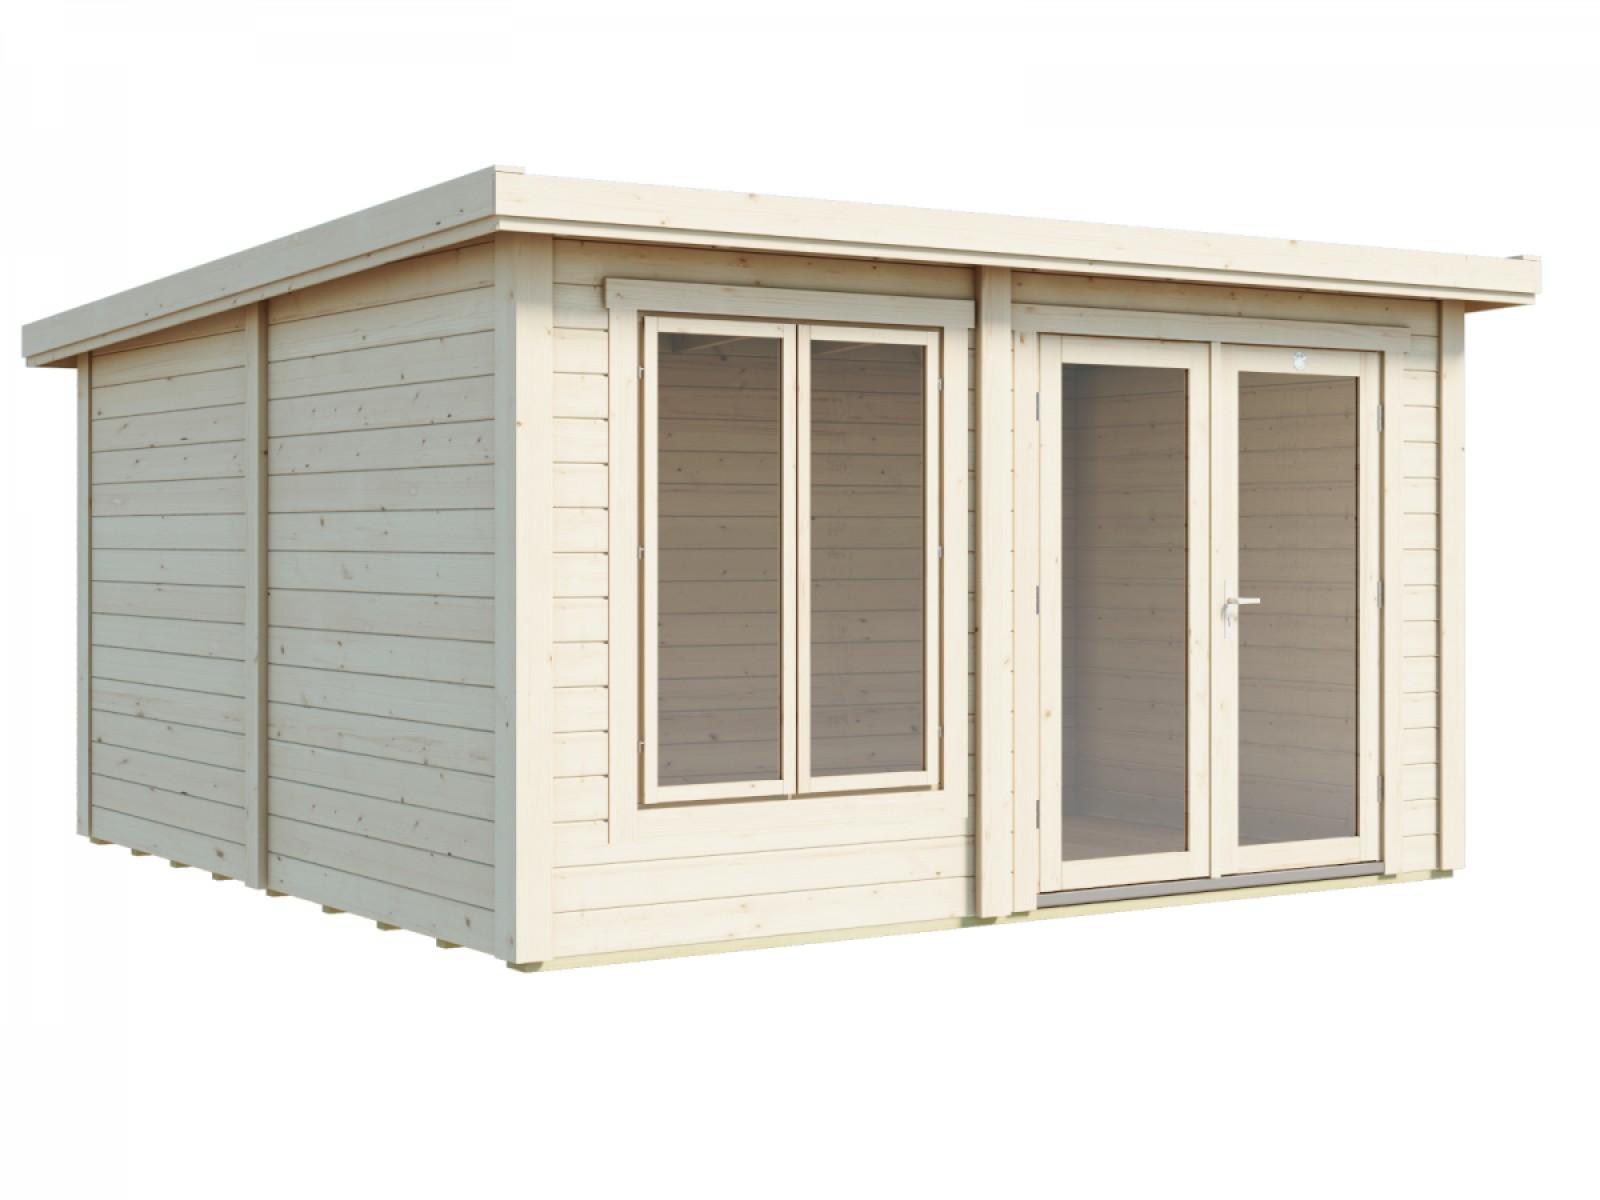 1624968812_342 Log Cabin.jpg